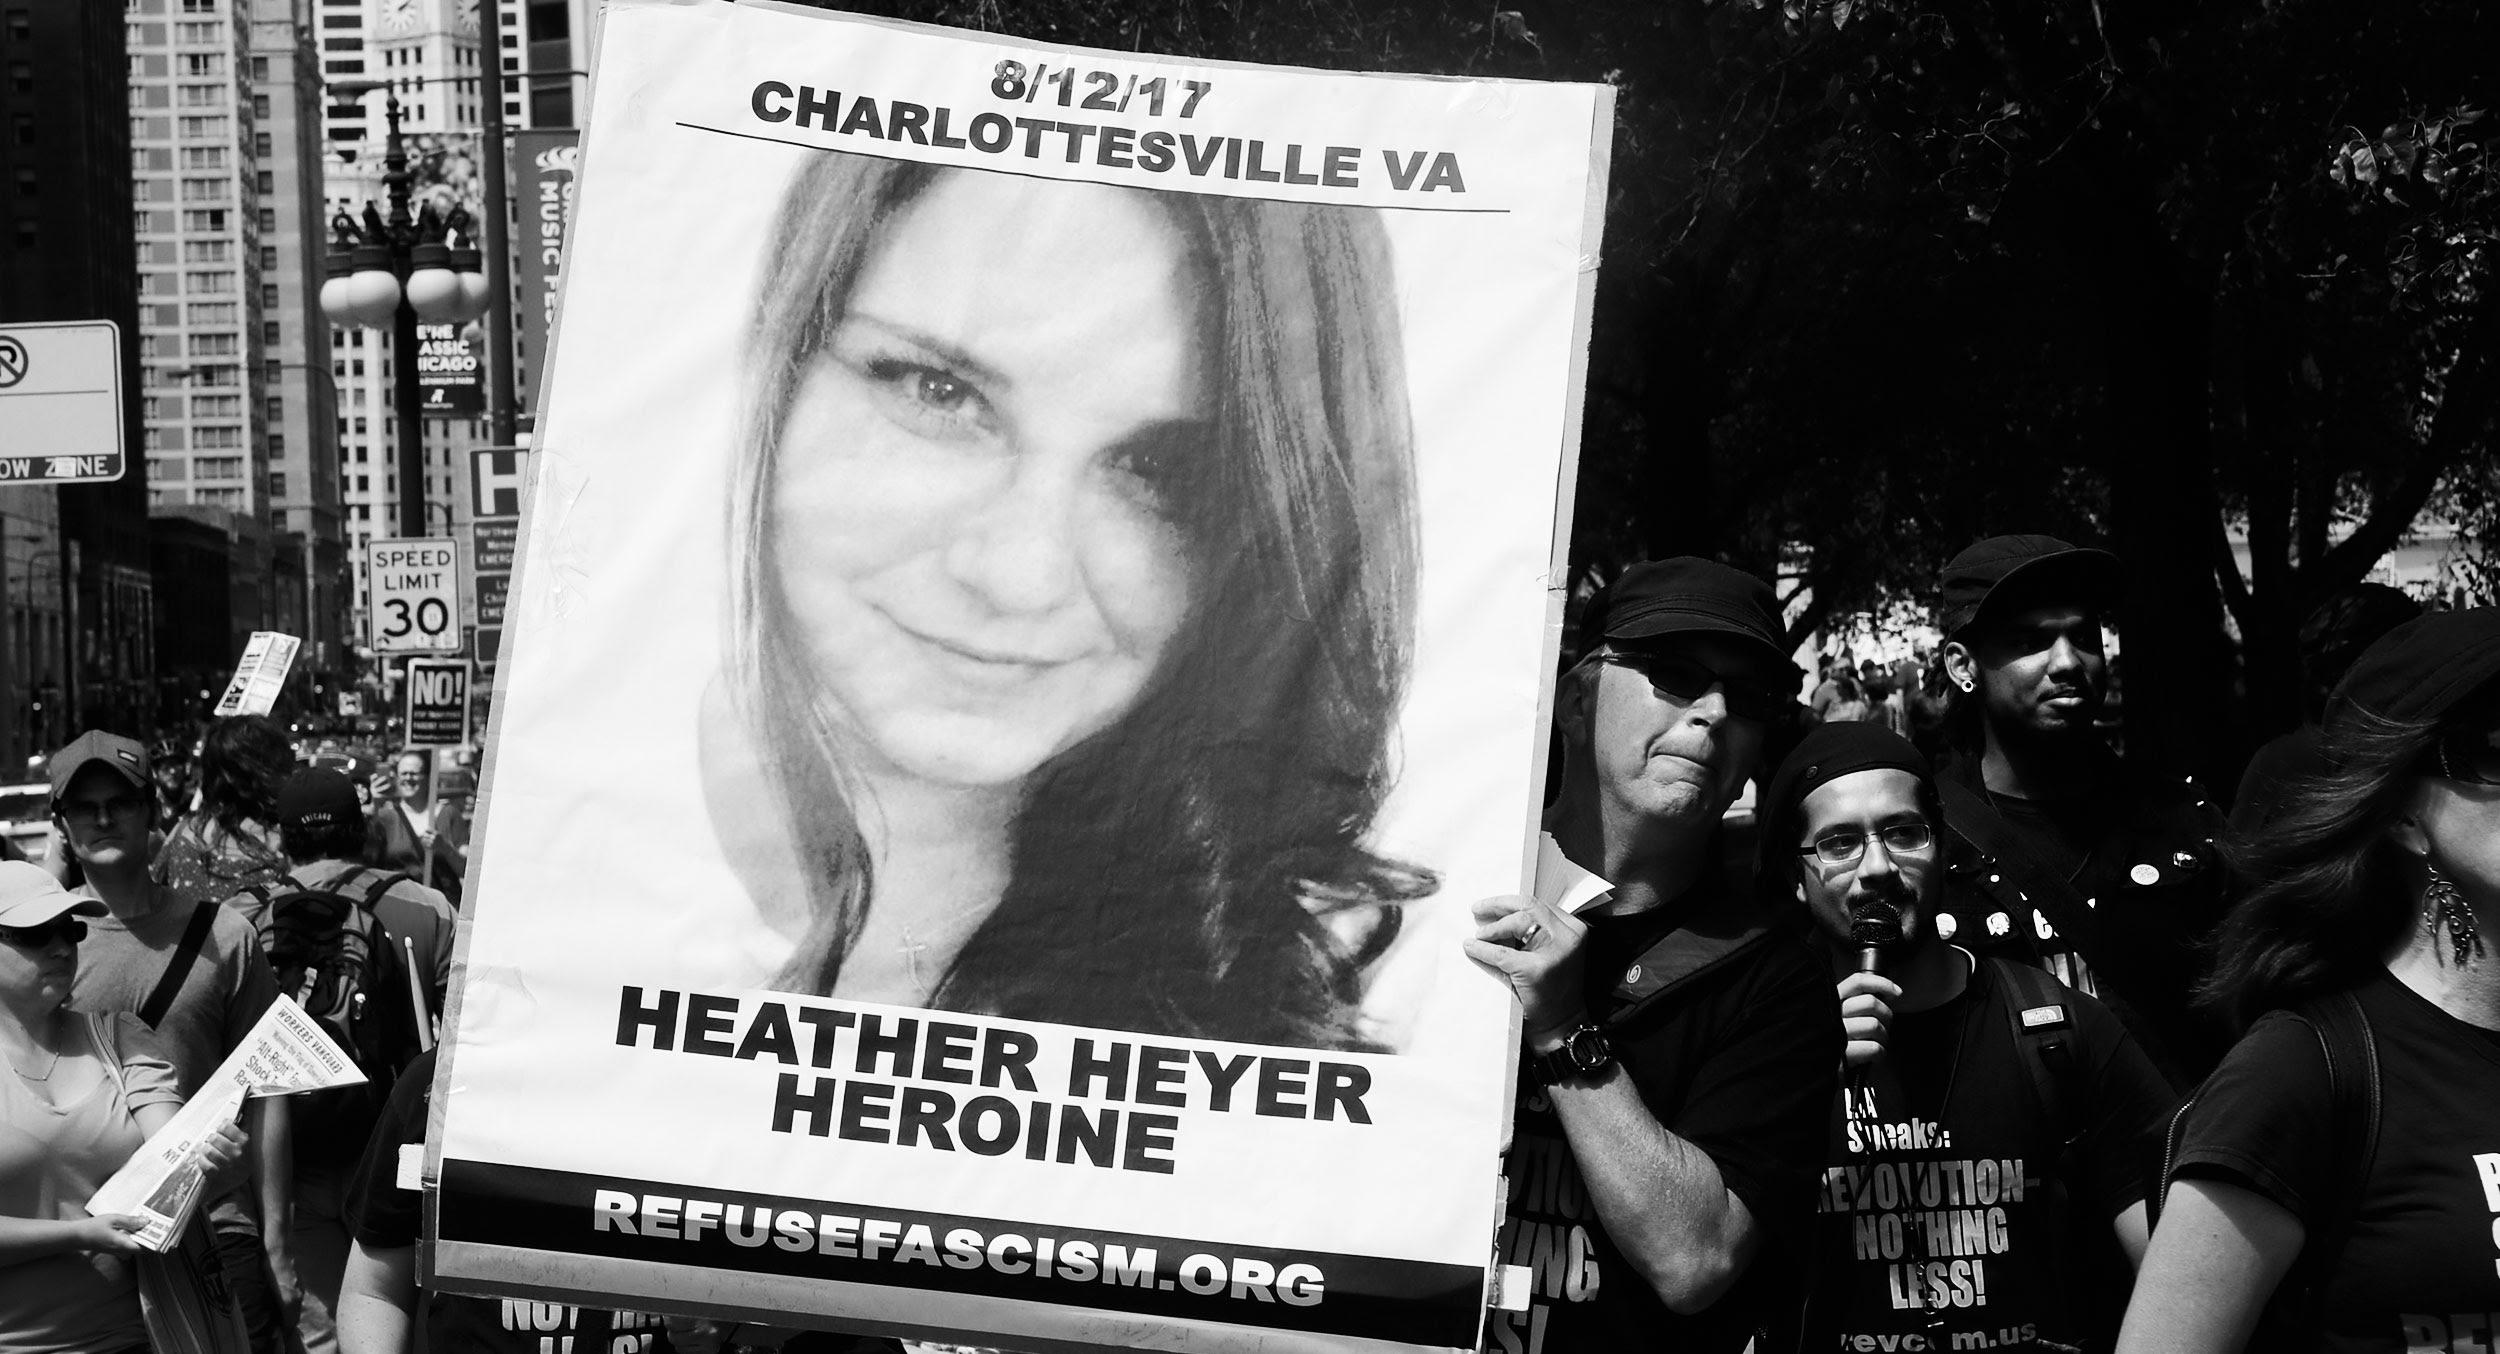 A memorialfor Heather Heyer. (Scott Olsen/Getty)